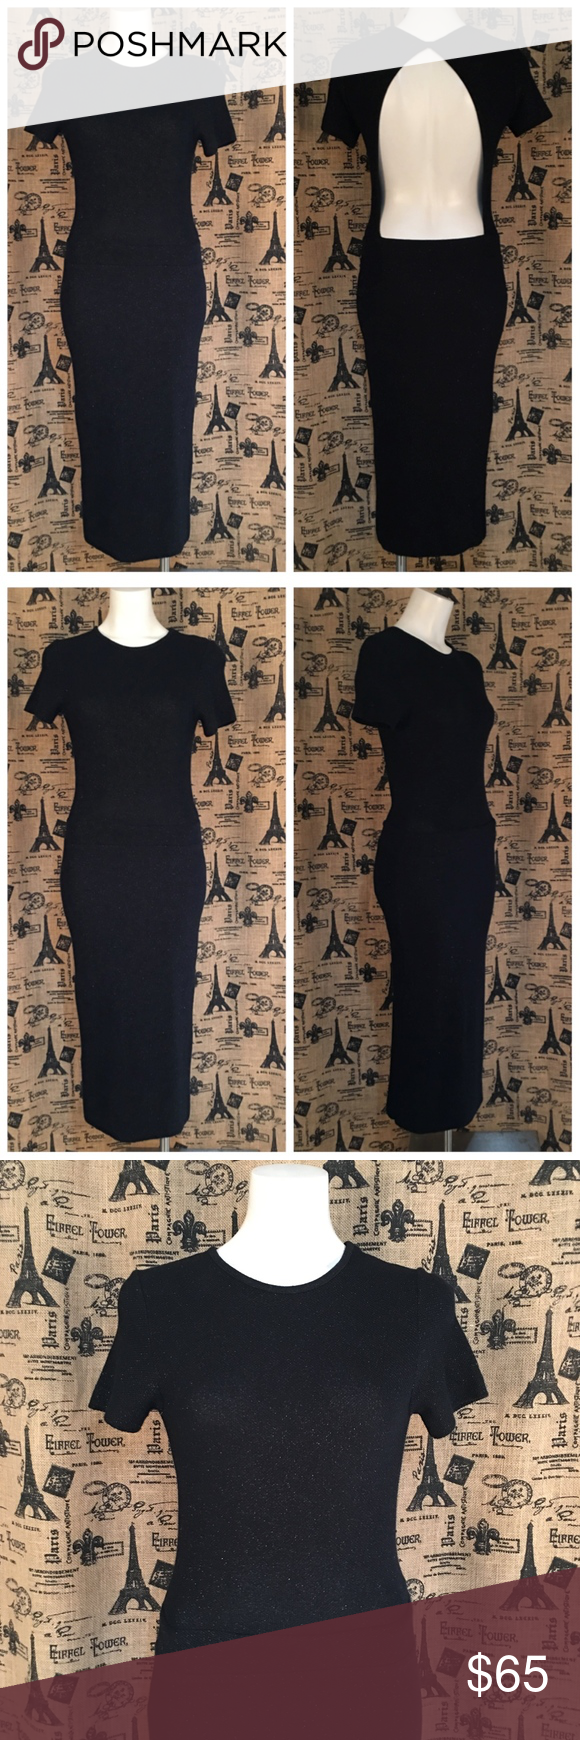 b60e9464 Zara Knit Black Open Back Maxi Dress Size M Brand: Zara Knit Size: M ...